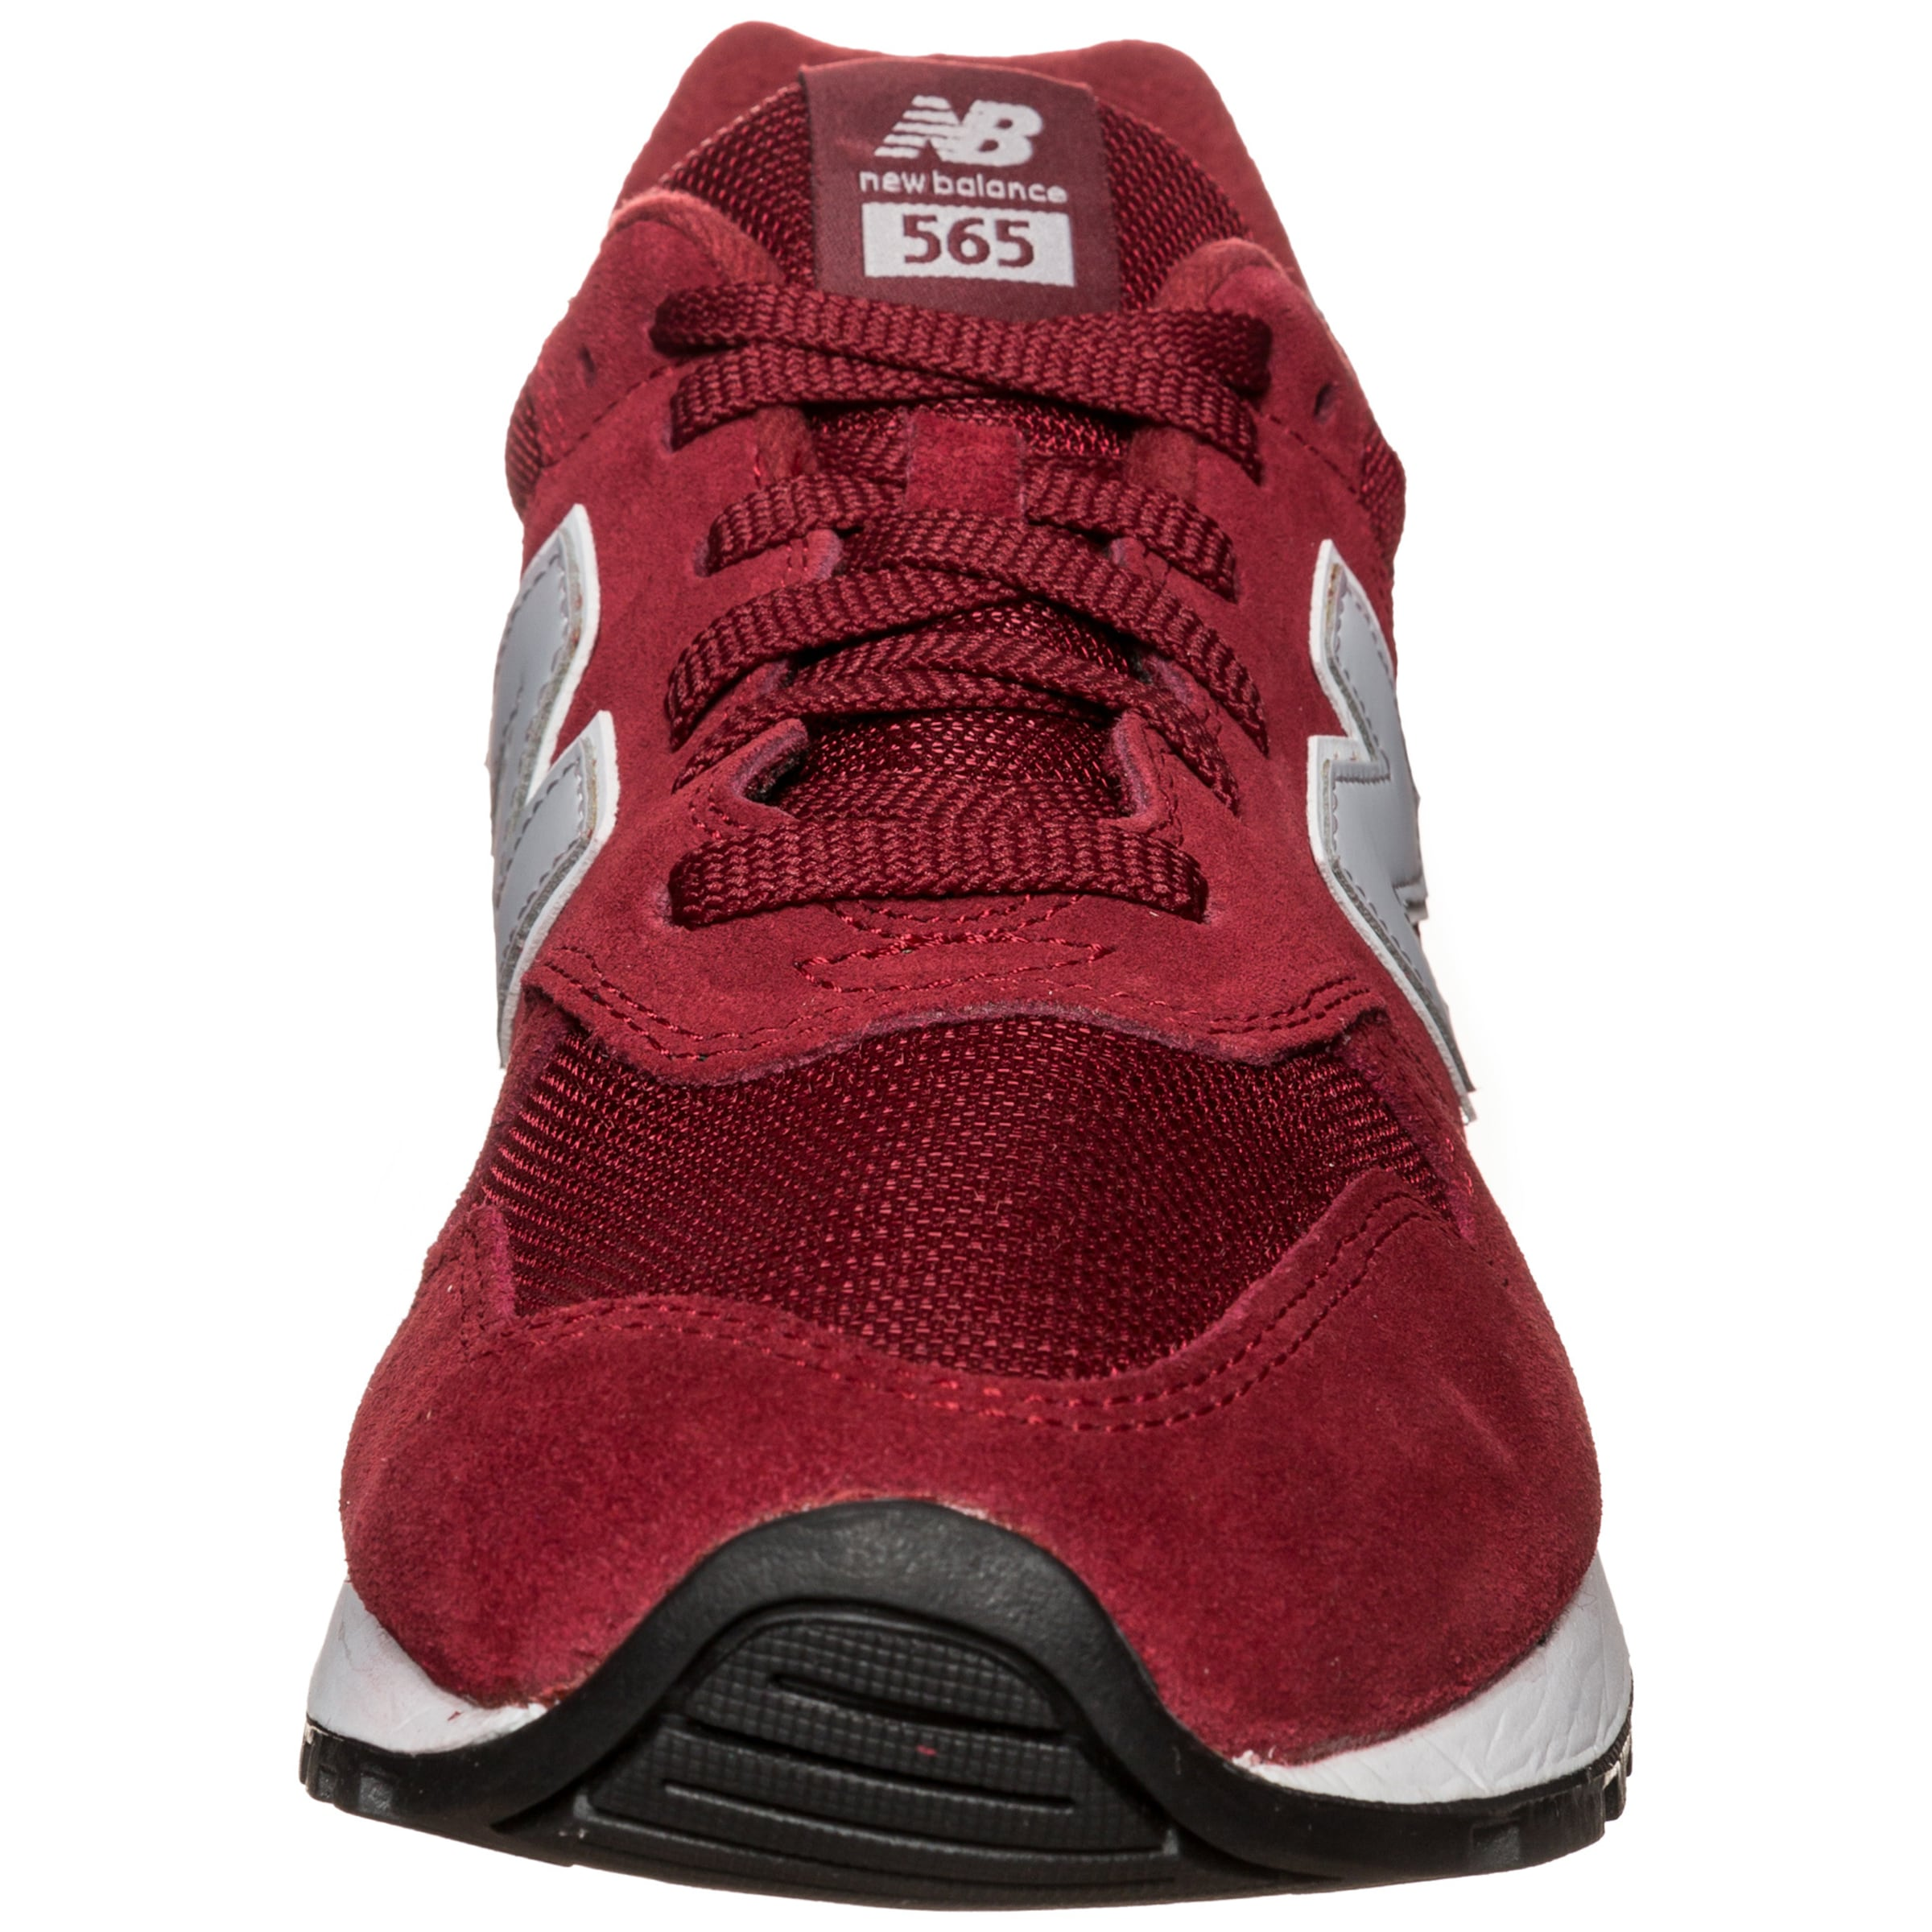 srg Rouge En 'ml565 Balance Basses New Baskets d' J3Fl1c5KuT